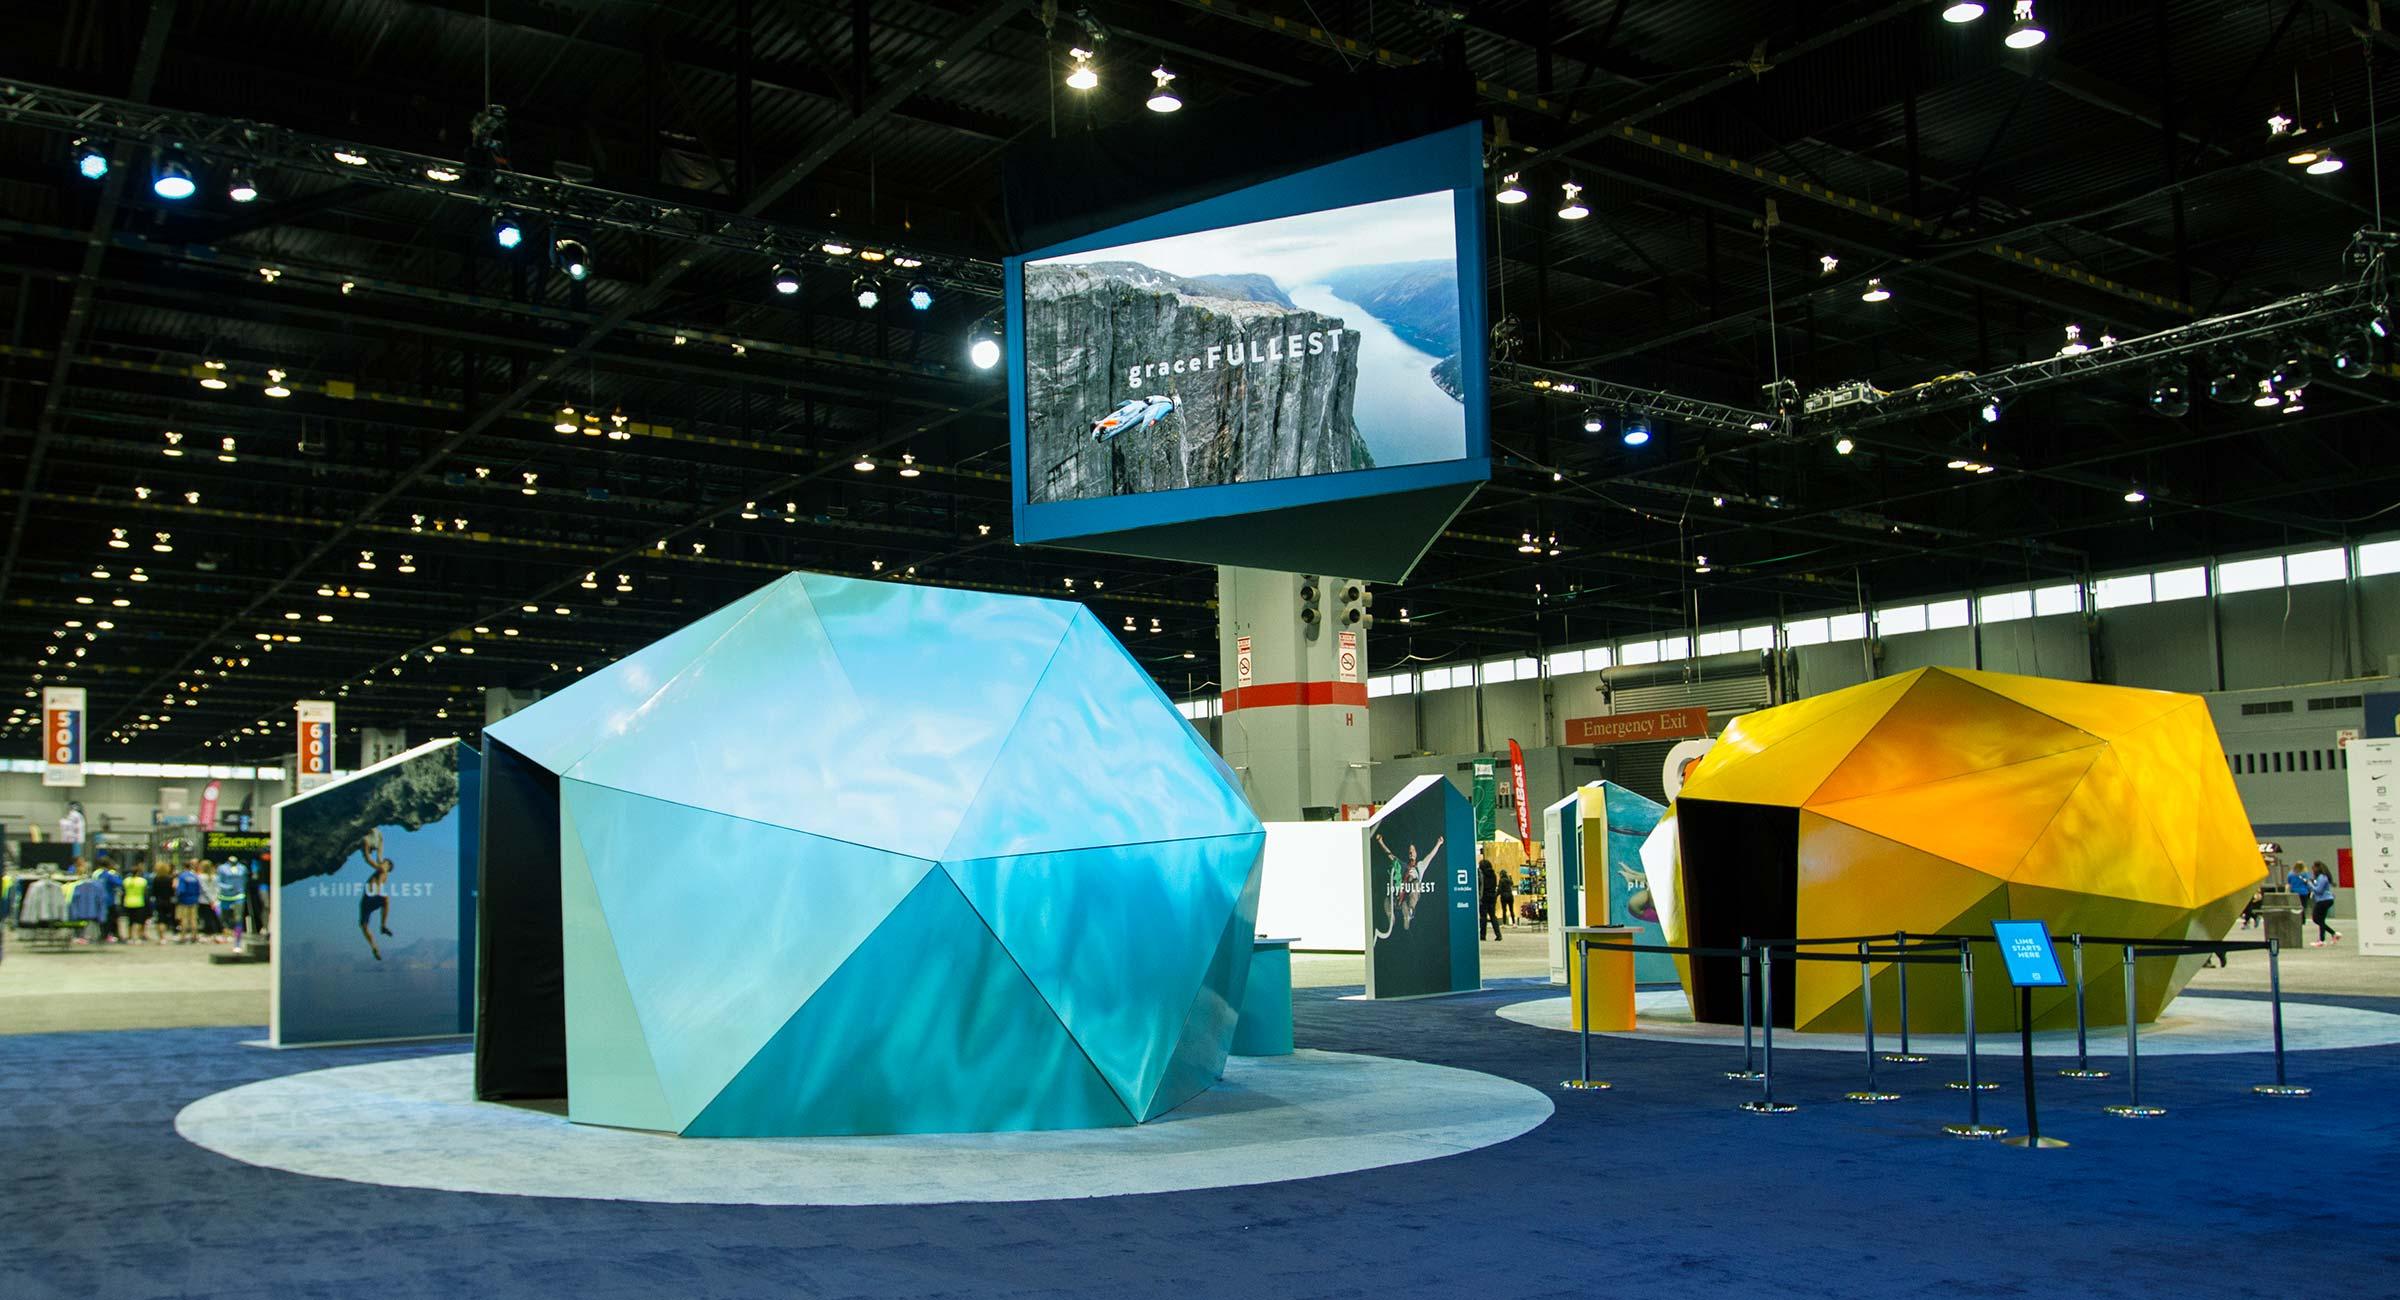 Abbott World Marathon Majors Interactive Pavilion